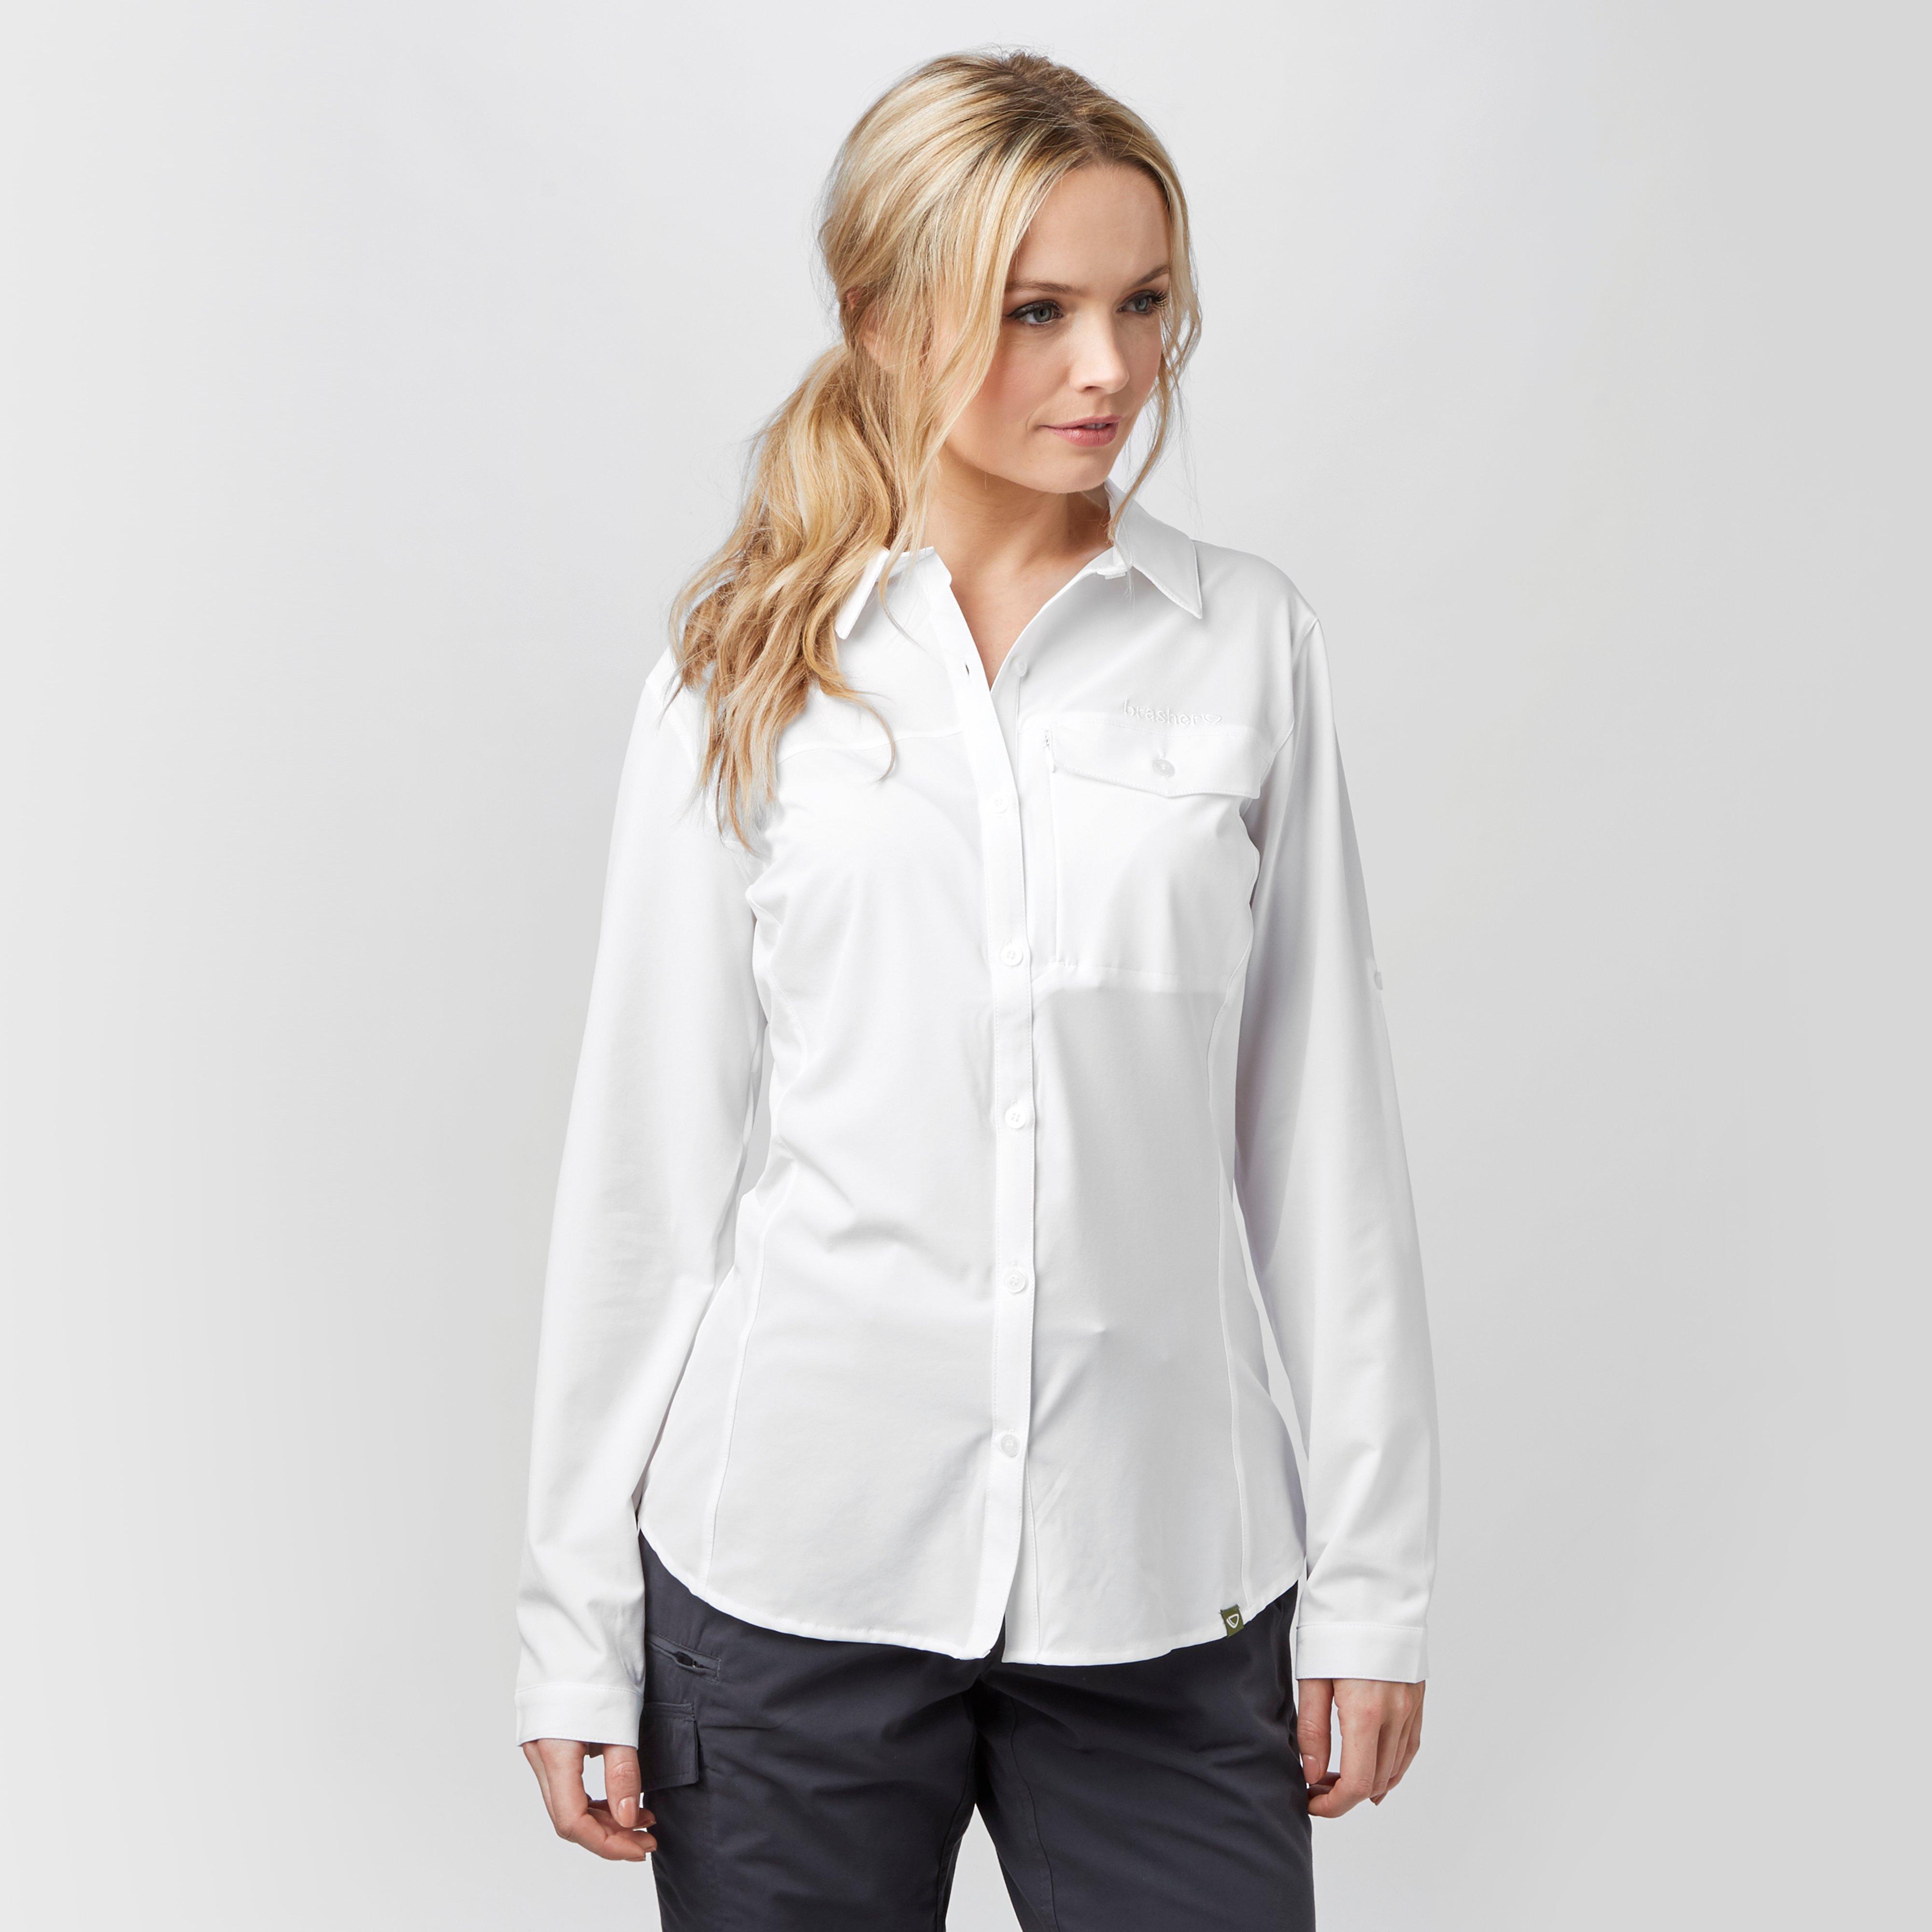 Brasher Brasher Womens Travel Shirt - White, White